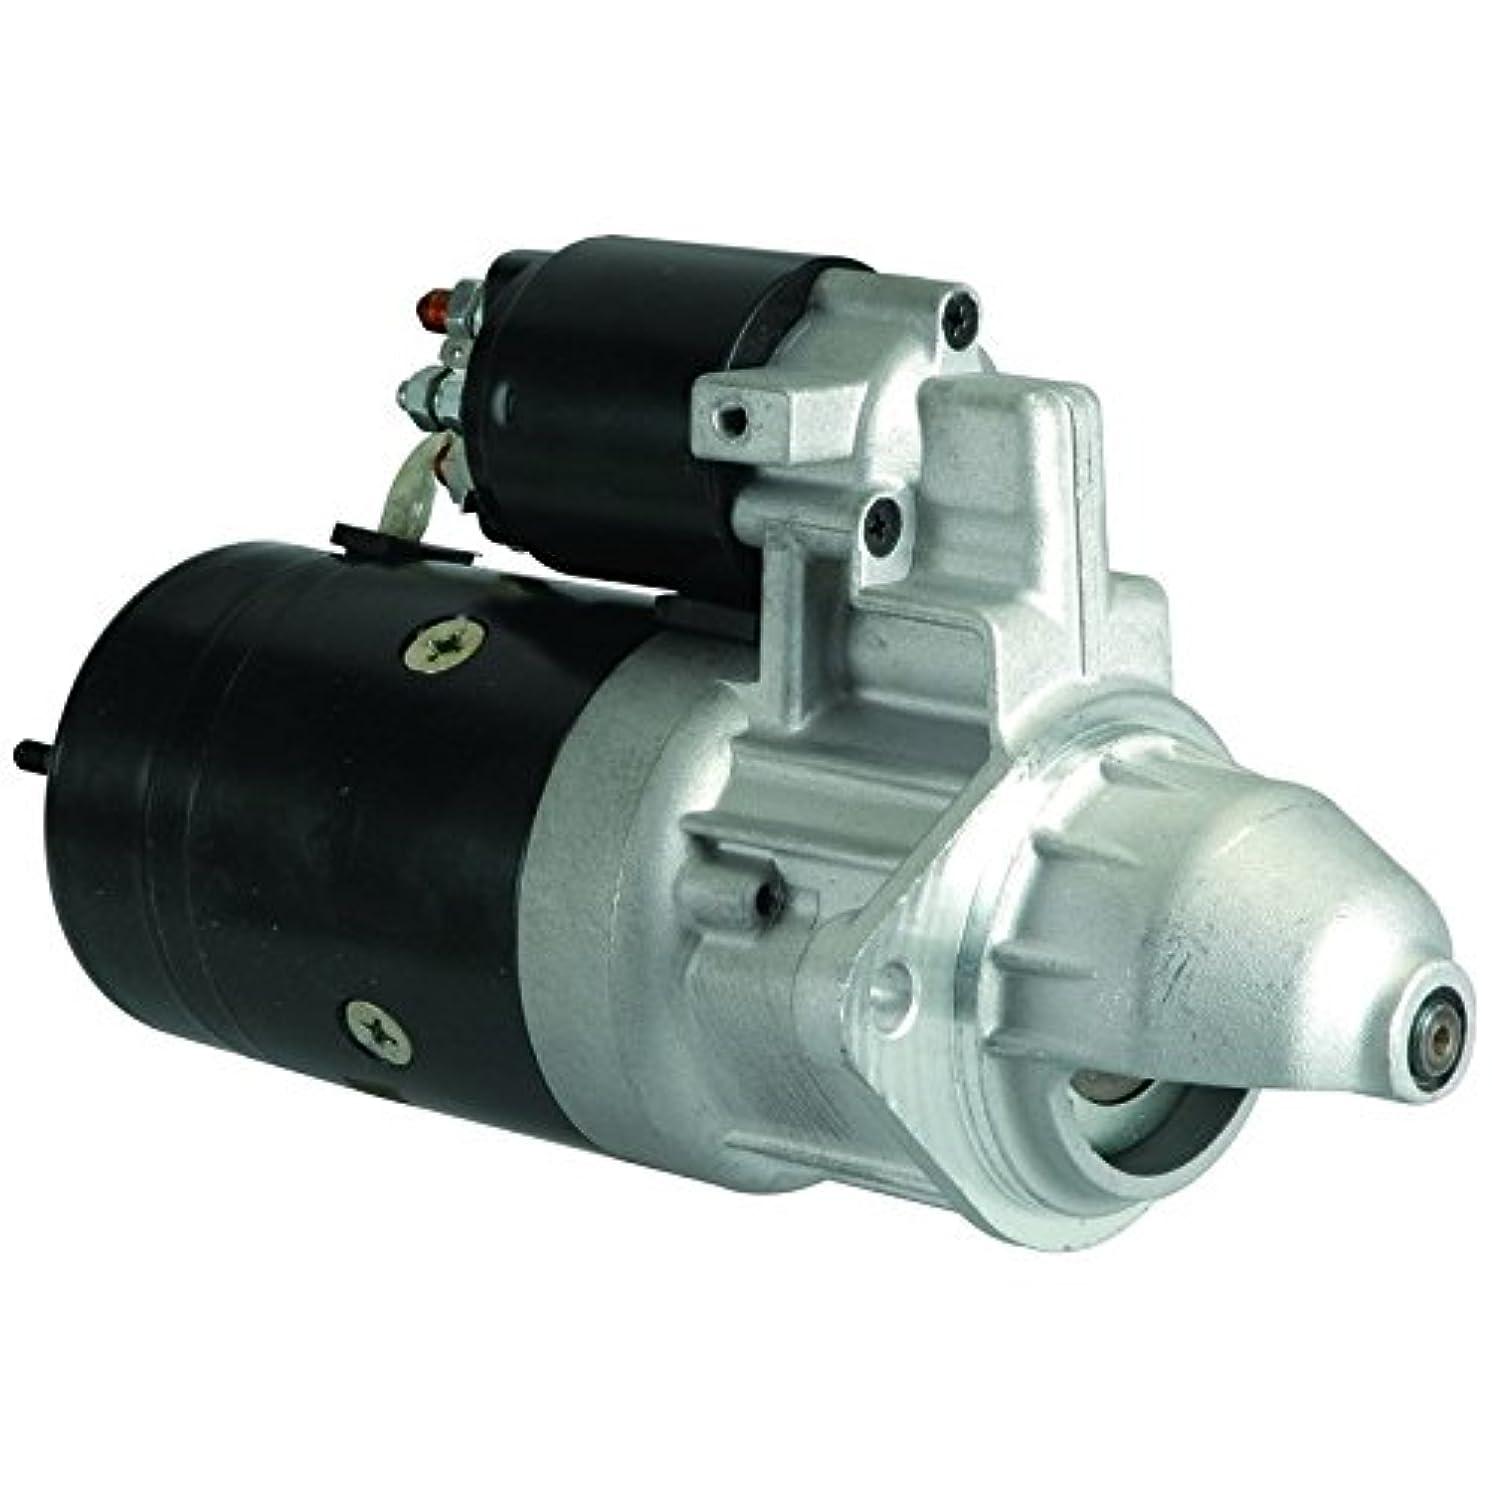 Premier Gear PG-17183 Professional Grade New Starter